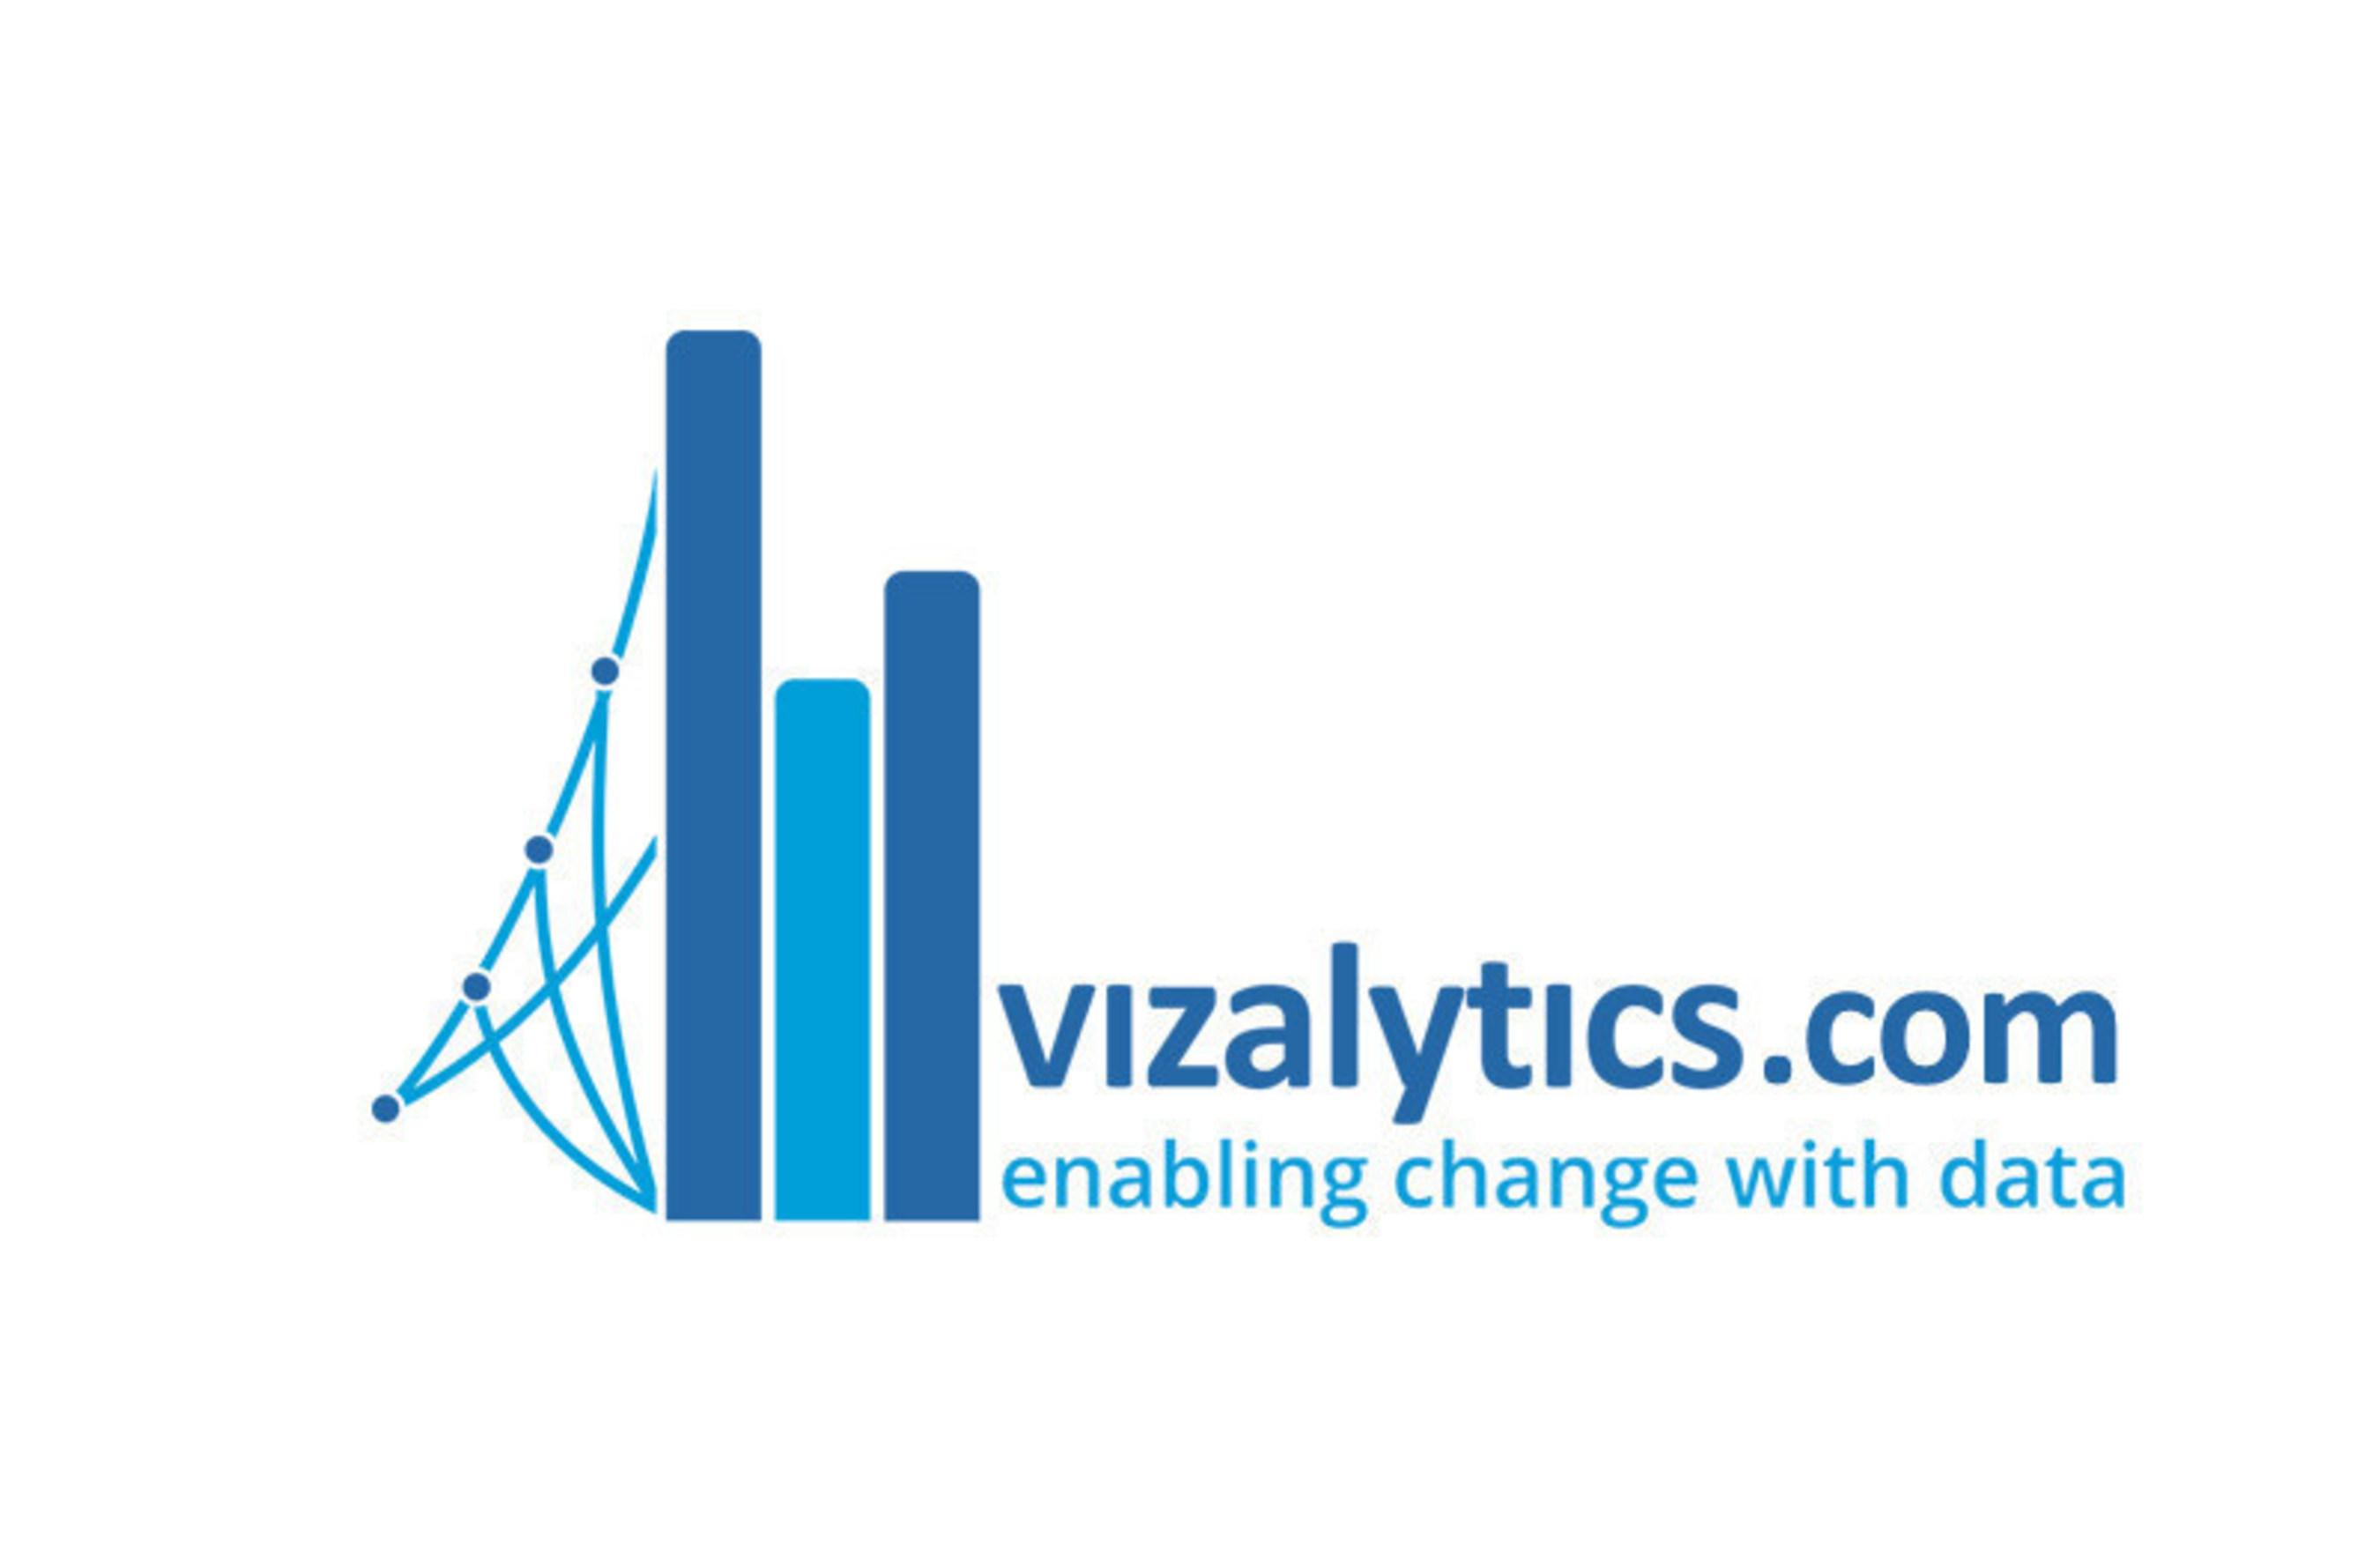 Vizalytics Joins Smart Cities Leaders at World Congress in Barcelona